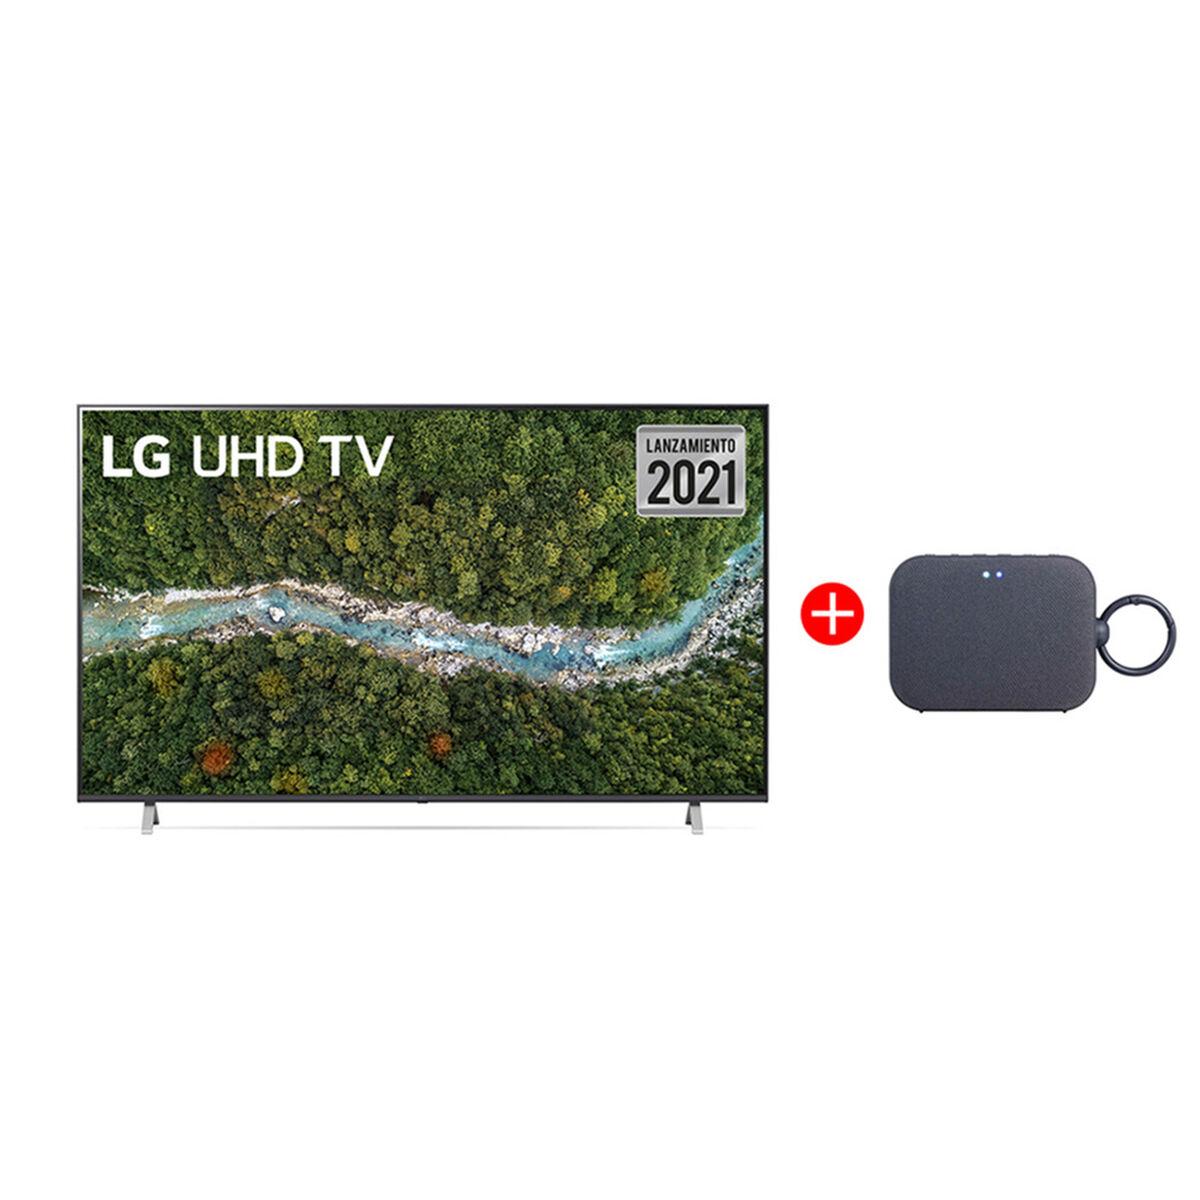 "Combo LED 55"" LG 55UP7750PSB Smart TV 4K UHD 2021 + Parlante Bluetooth PM1 Azul"